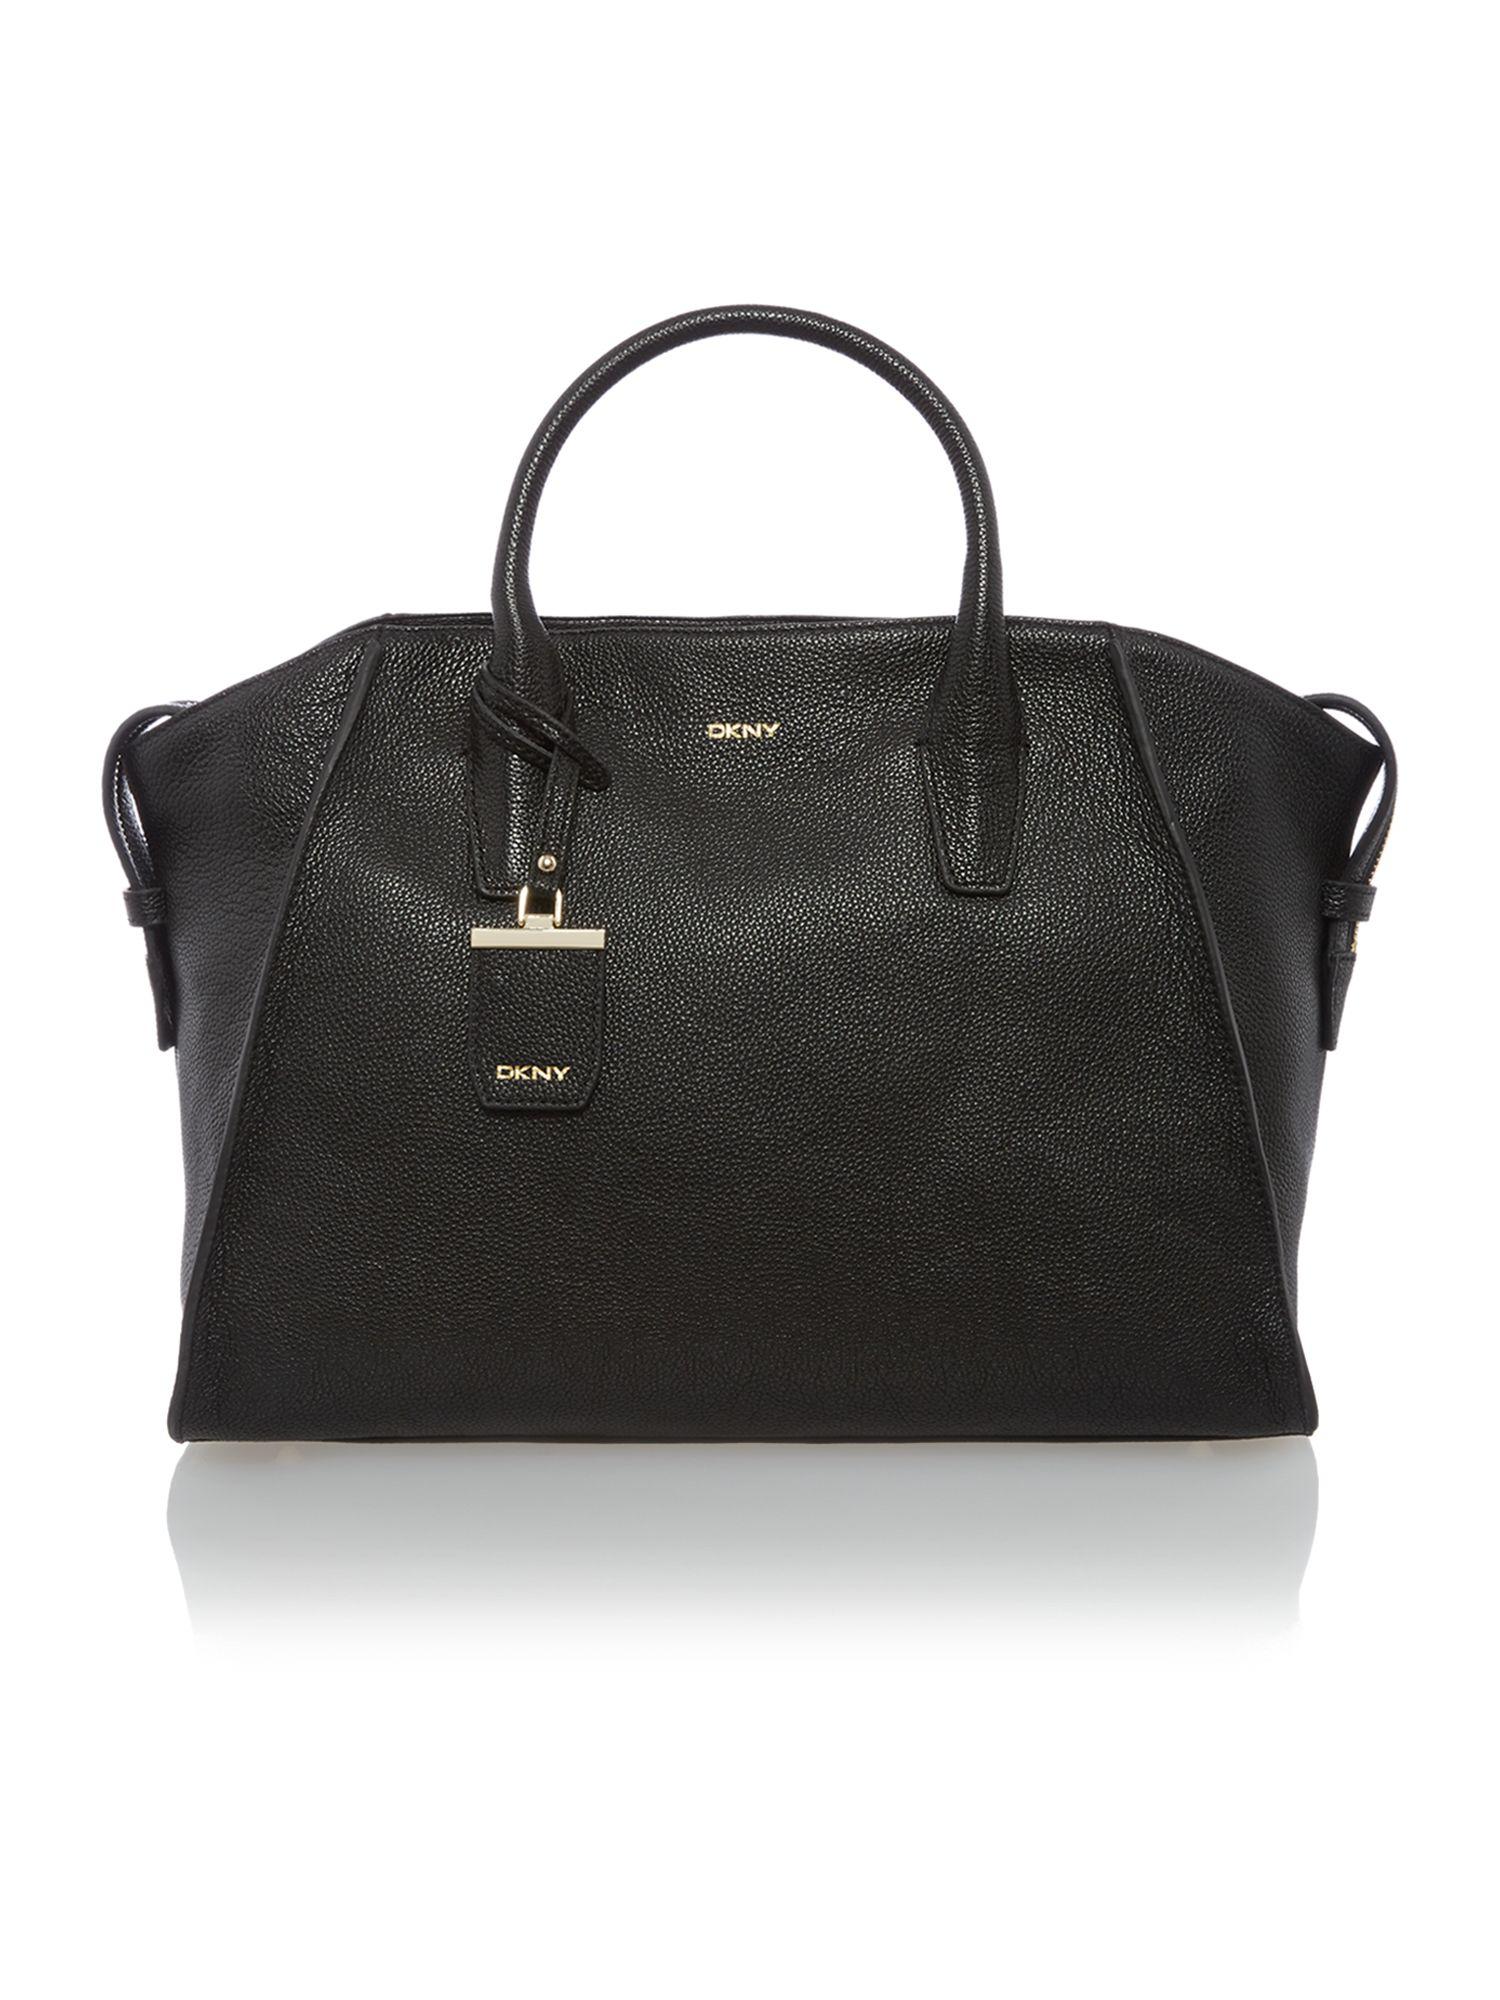 dkny chelsea vintage black large satchel bag in black lyst